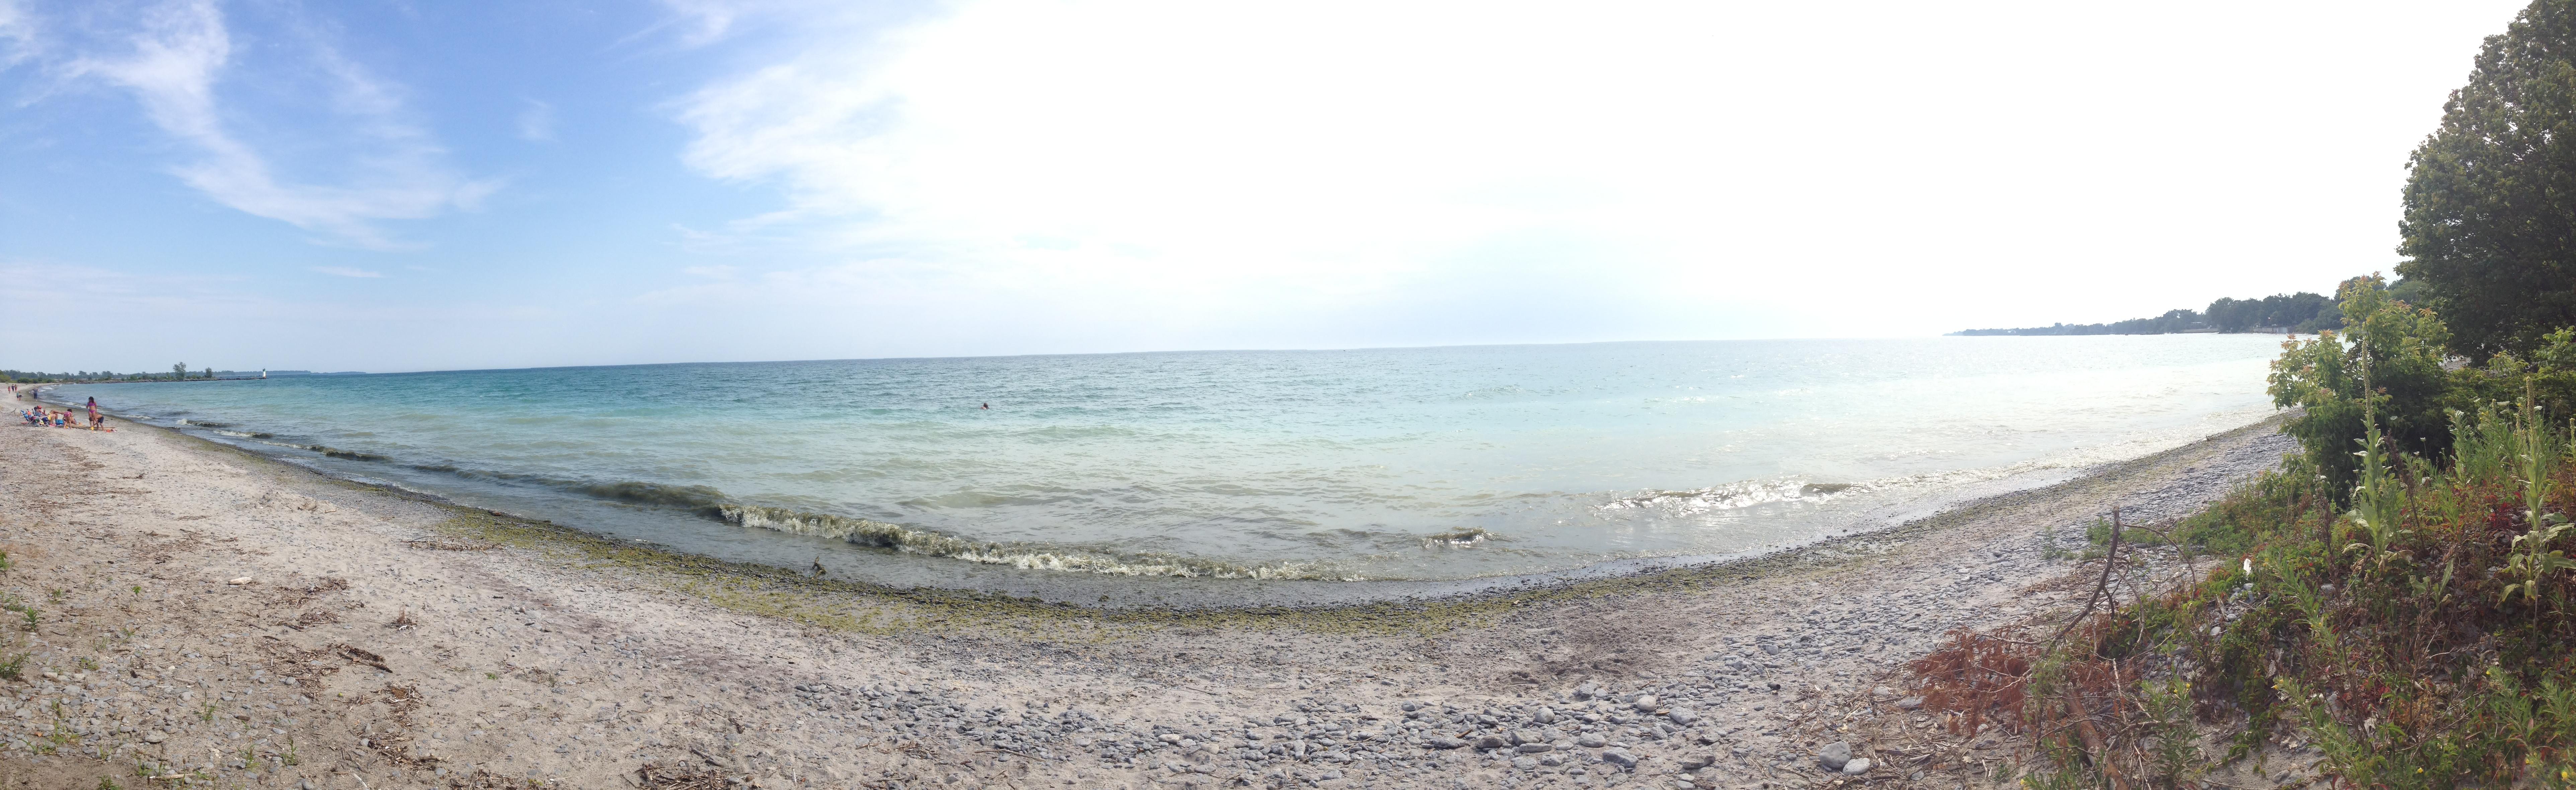 Lake Ontario view